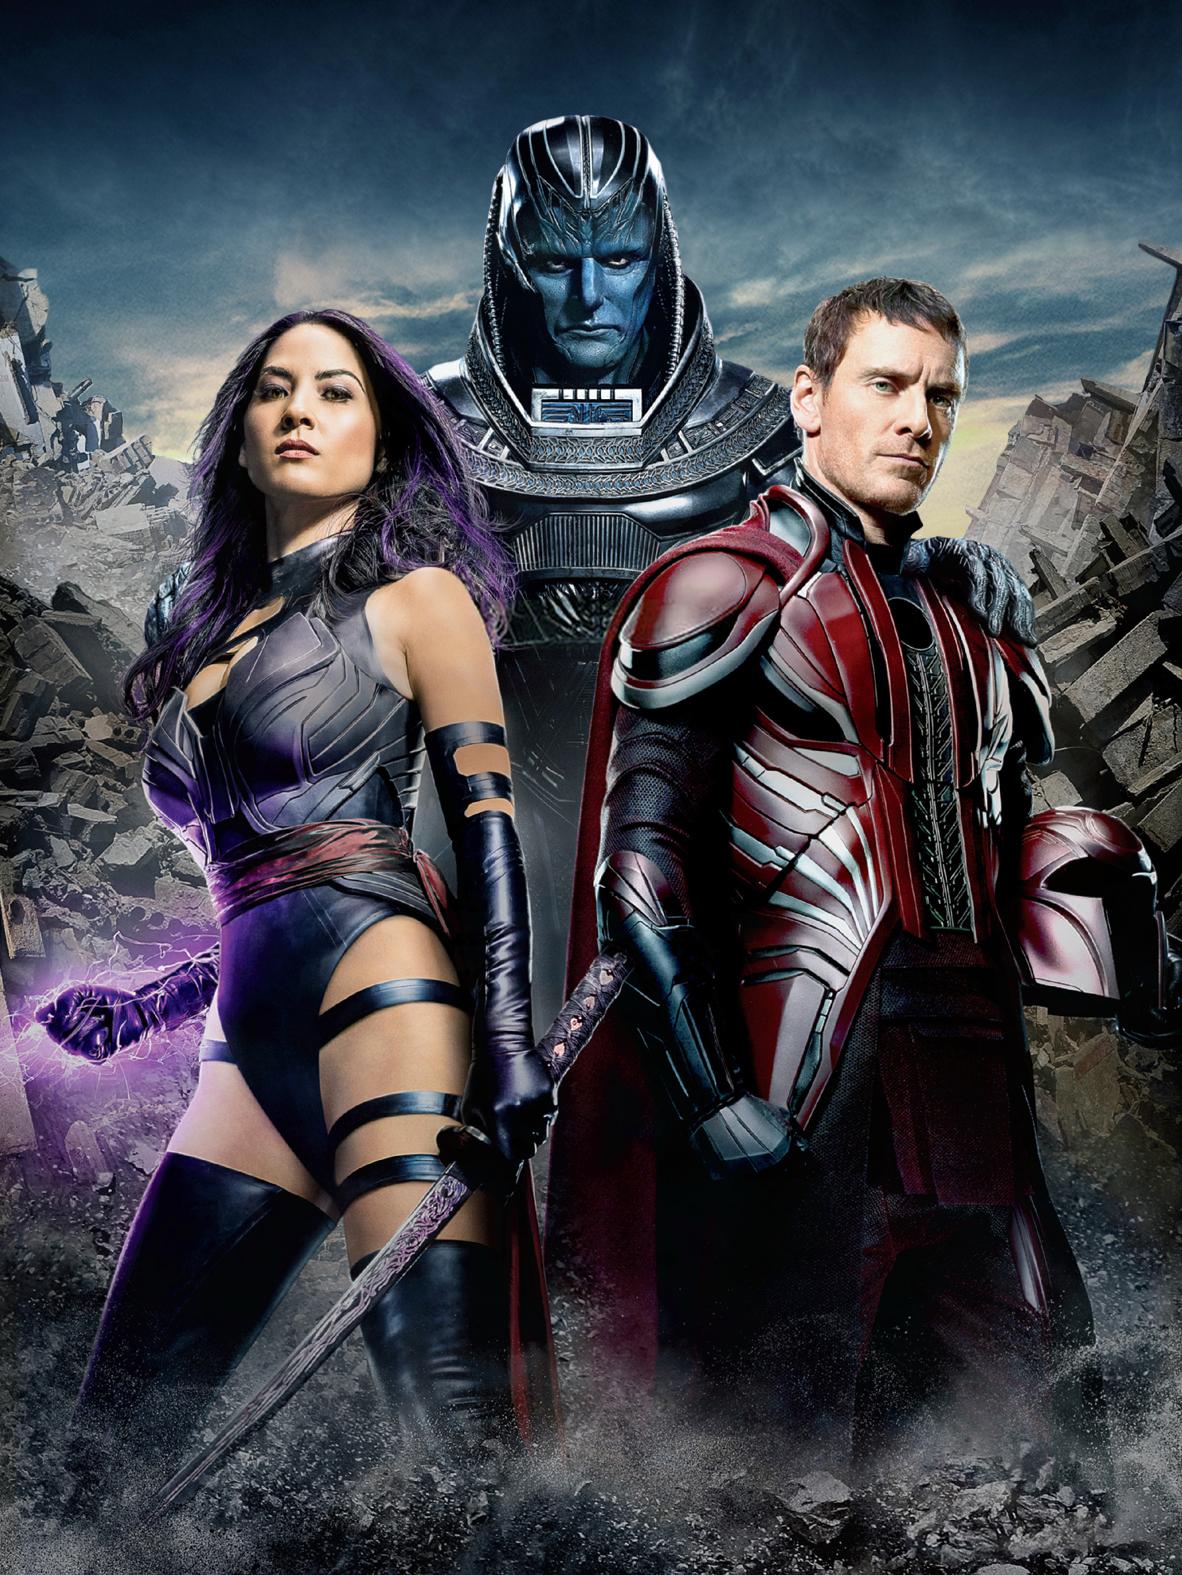 X Men Apocalypse Wallpapers Movie Hq X Men Apocalypse Pictures